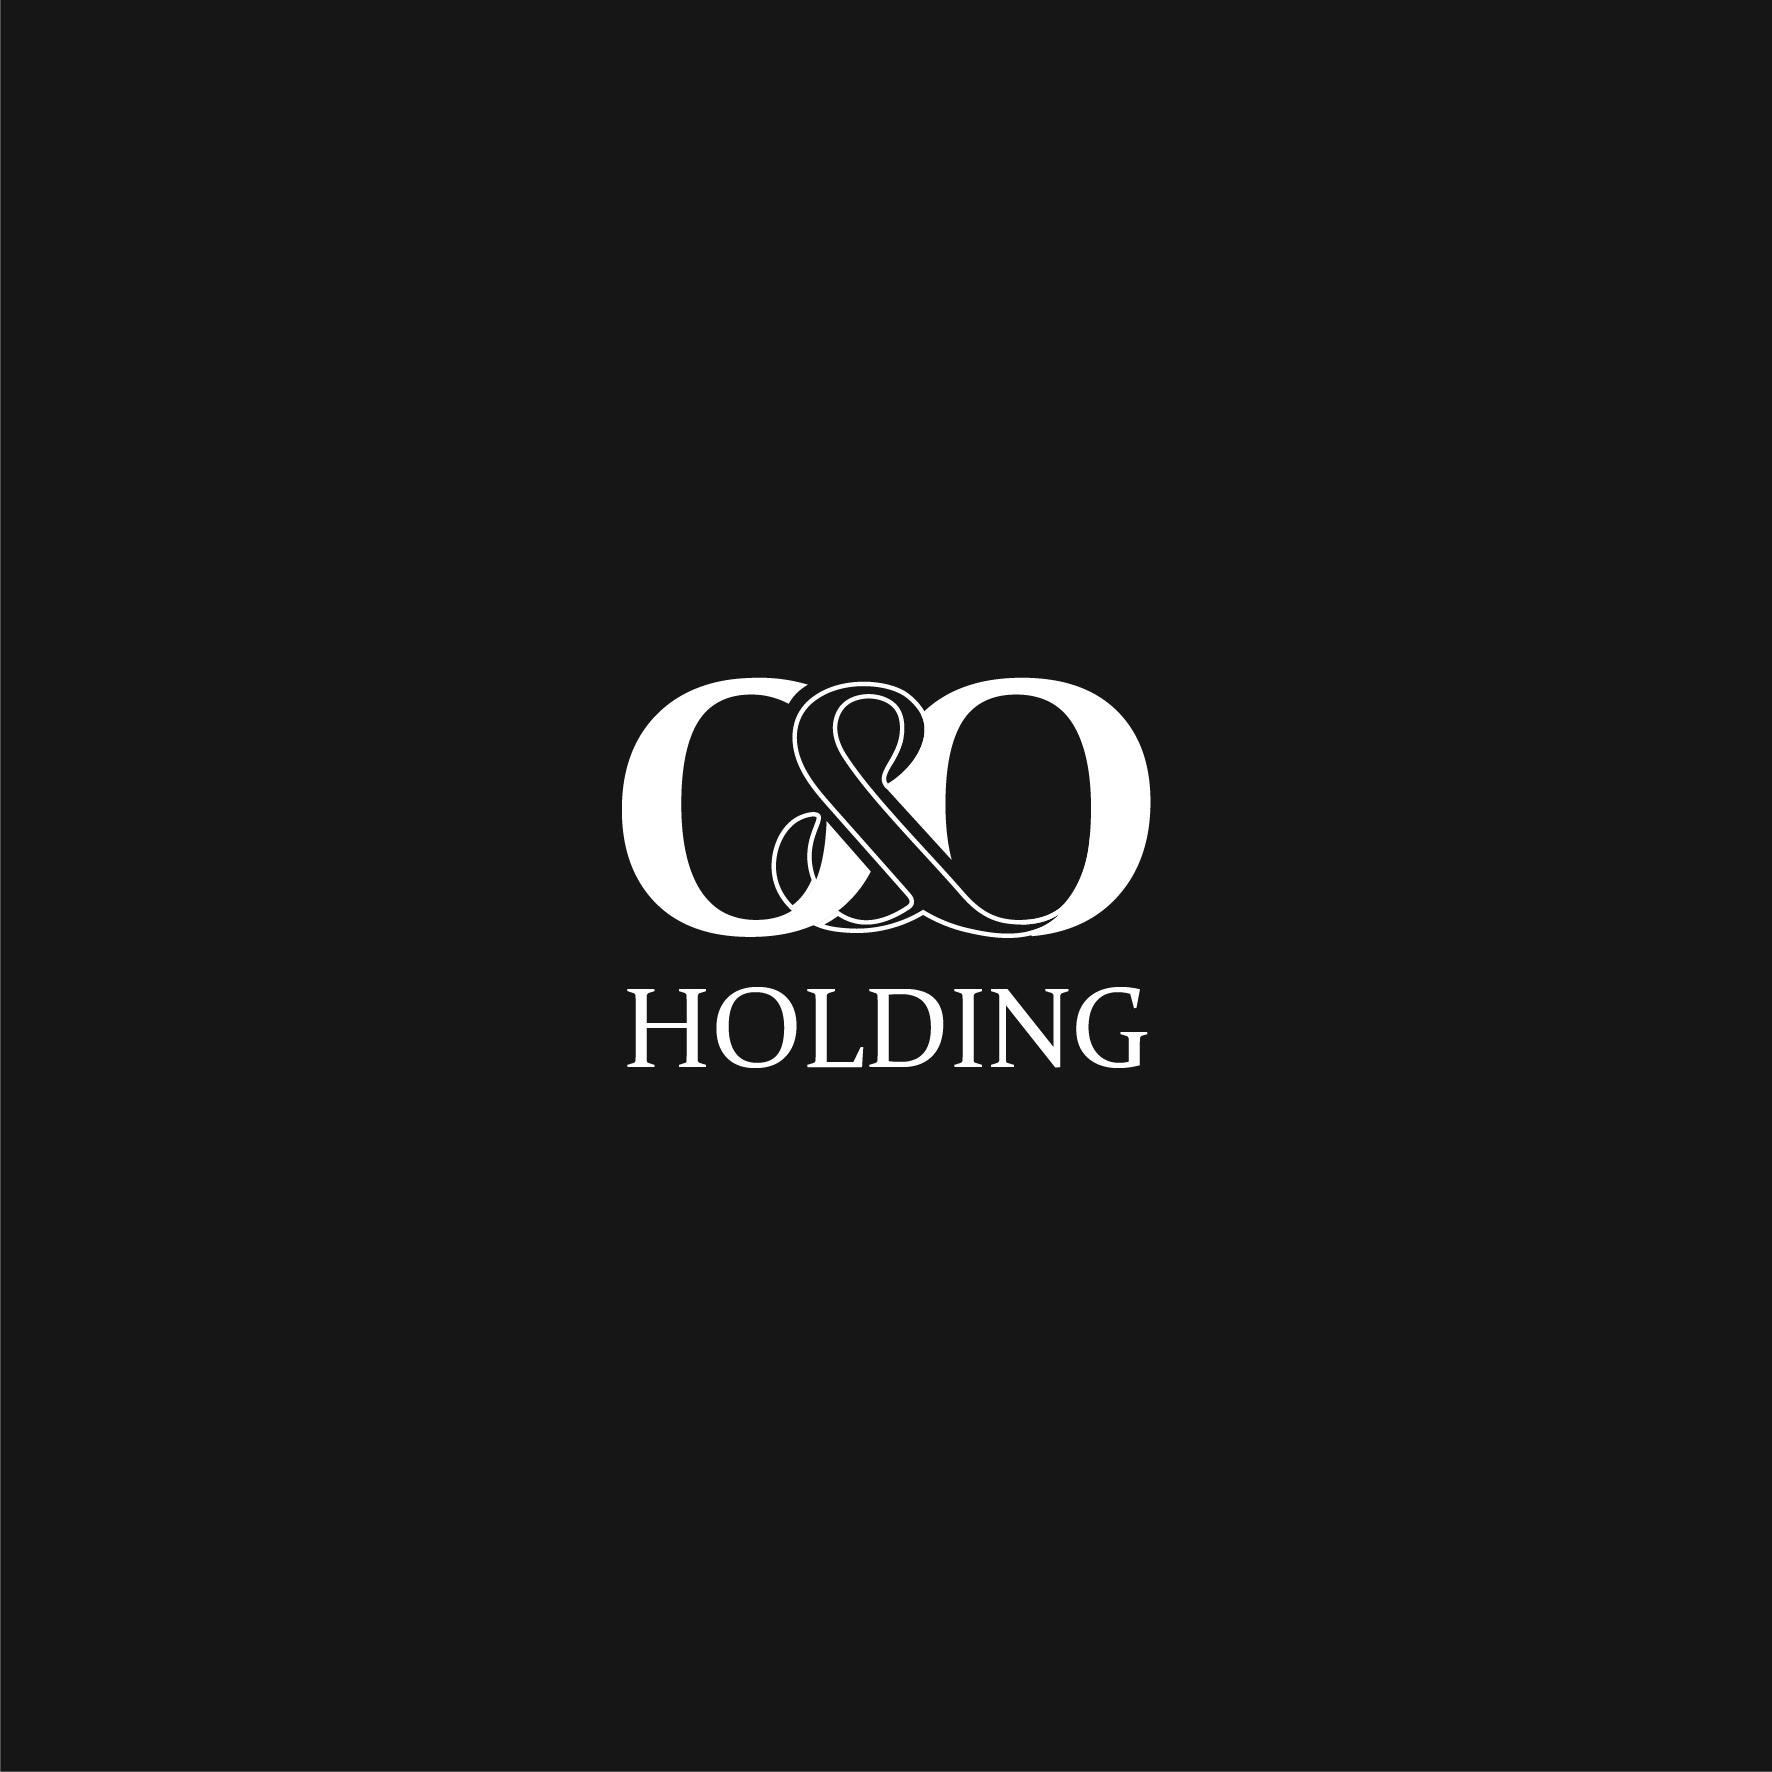 "Разработка Логотипа +  Фирменного знака для компании ""O & O HOLDING"" фото f_3185c7b0440df4ce.jpg"